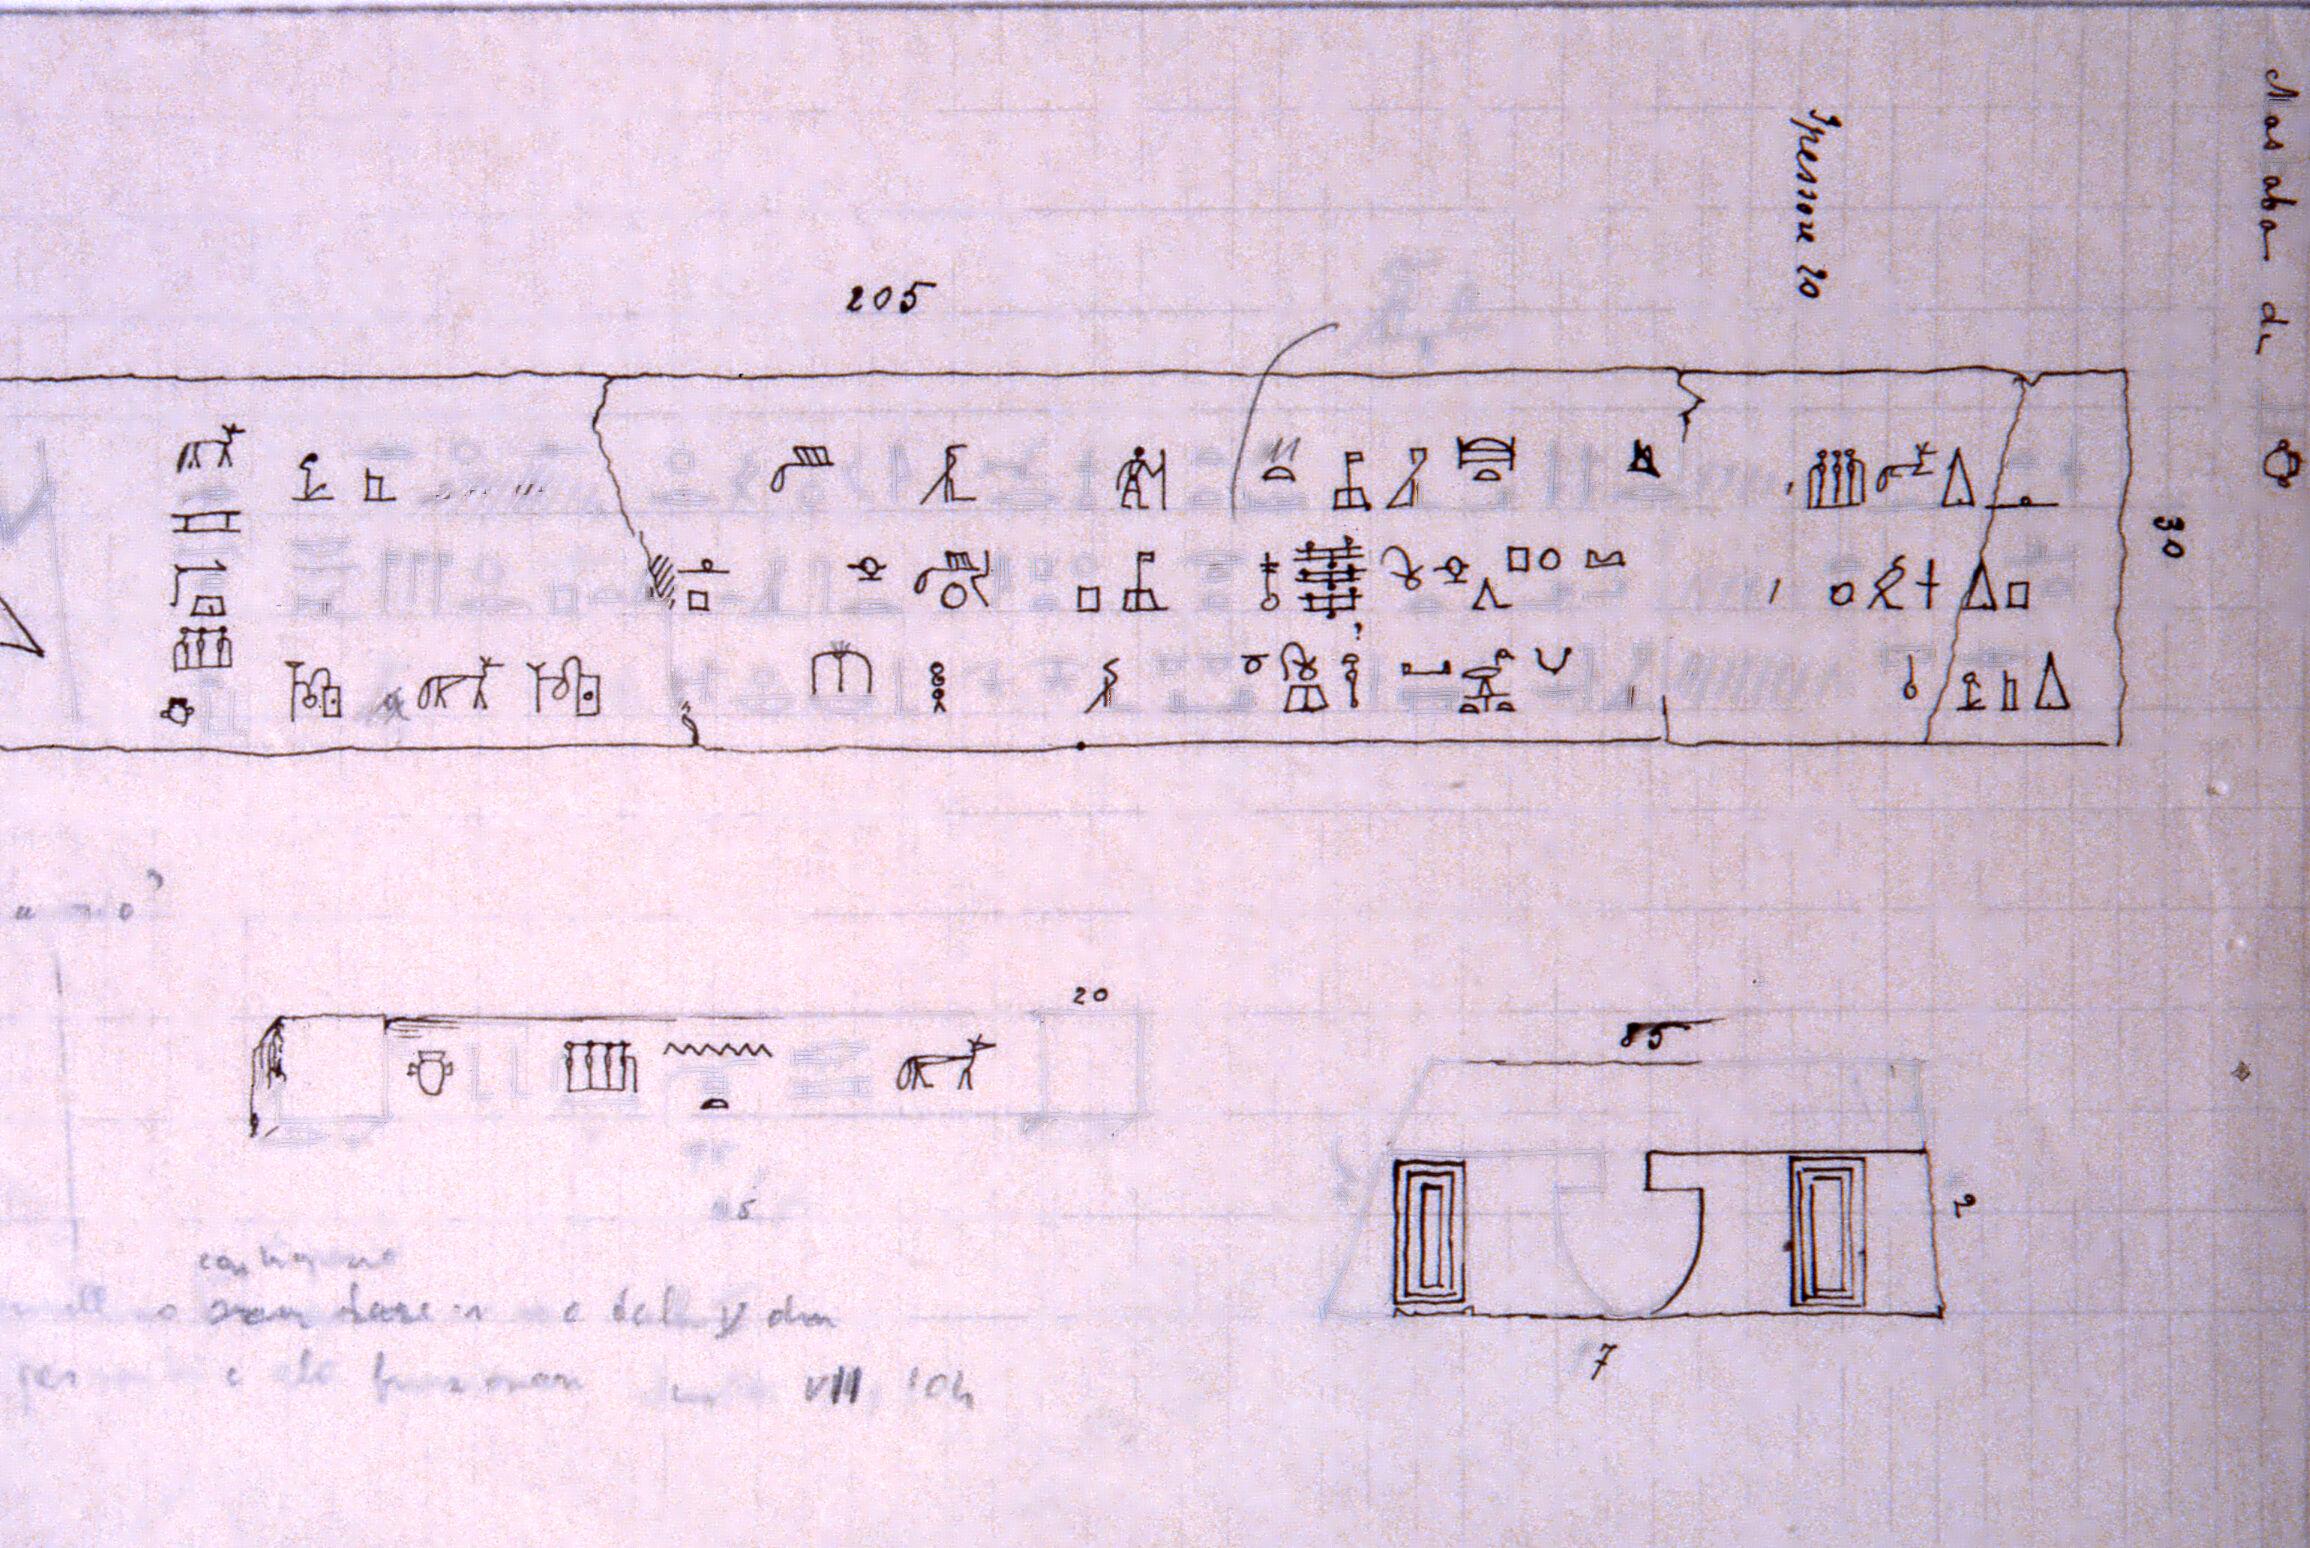 Plans and drawings: Site: Giza; View: Bebib